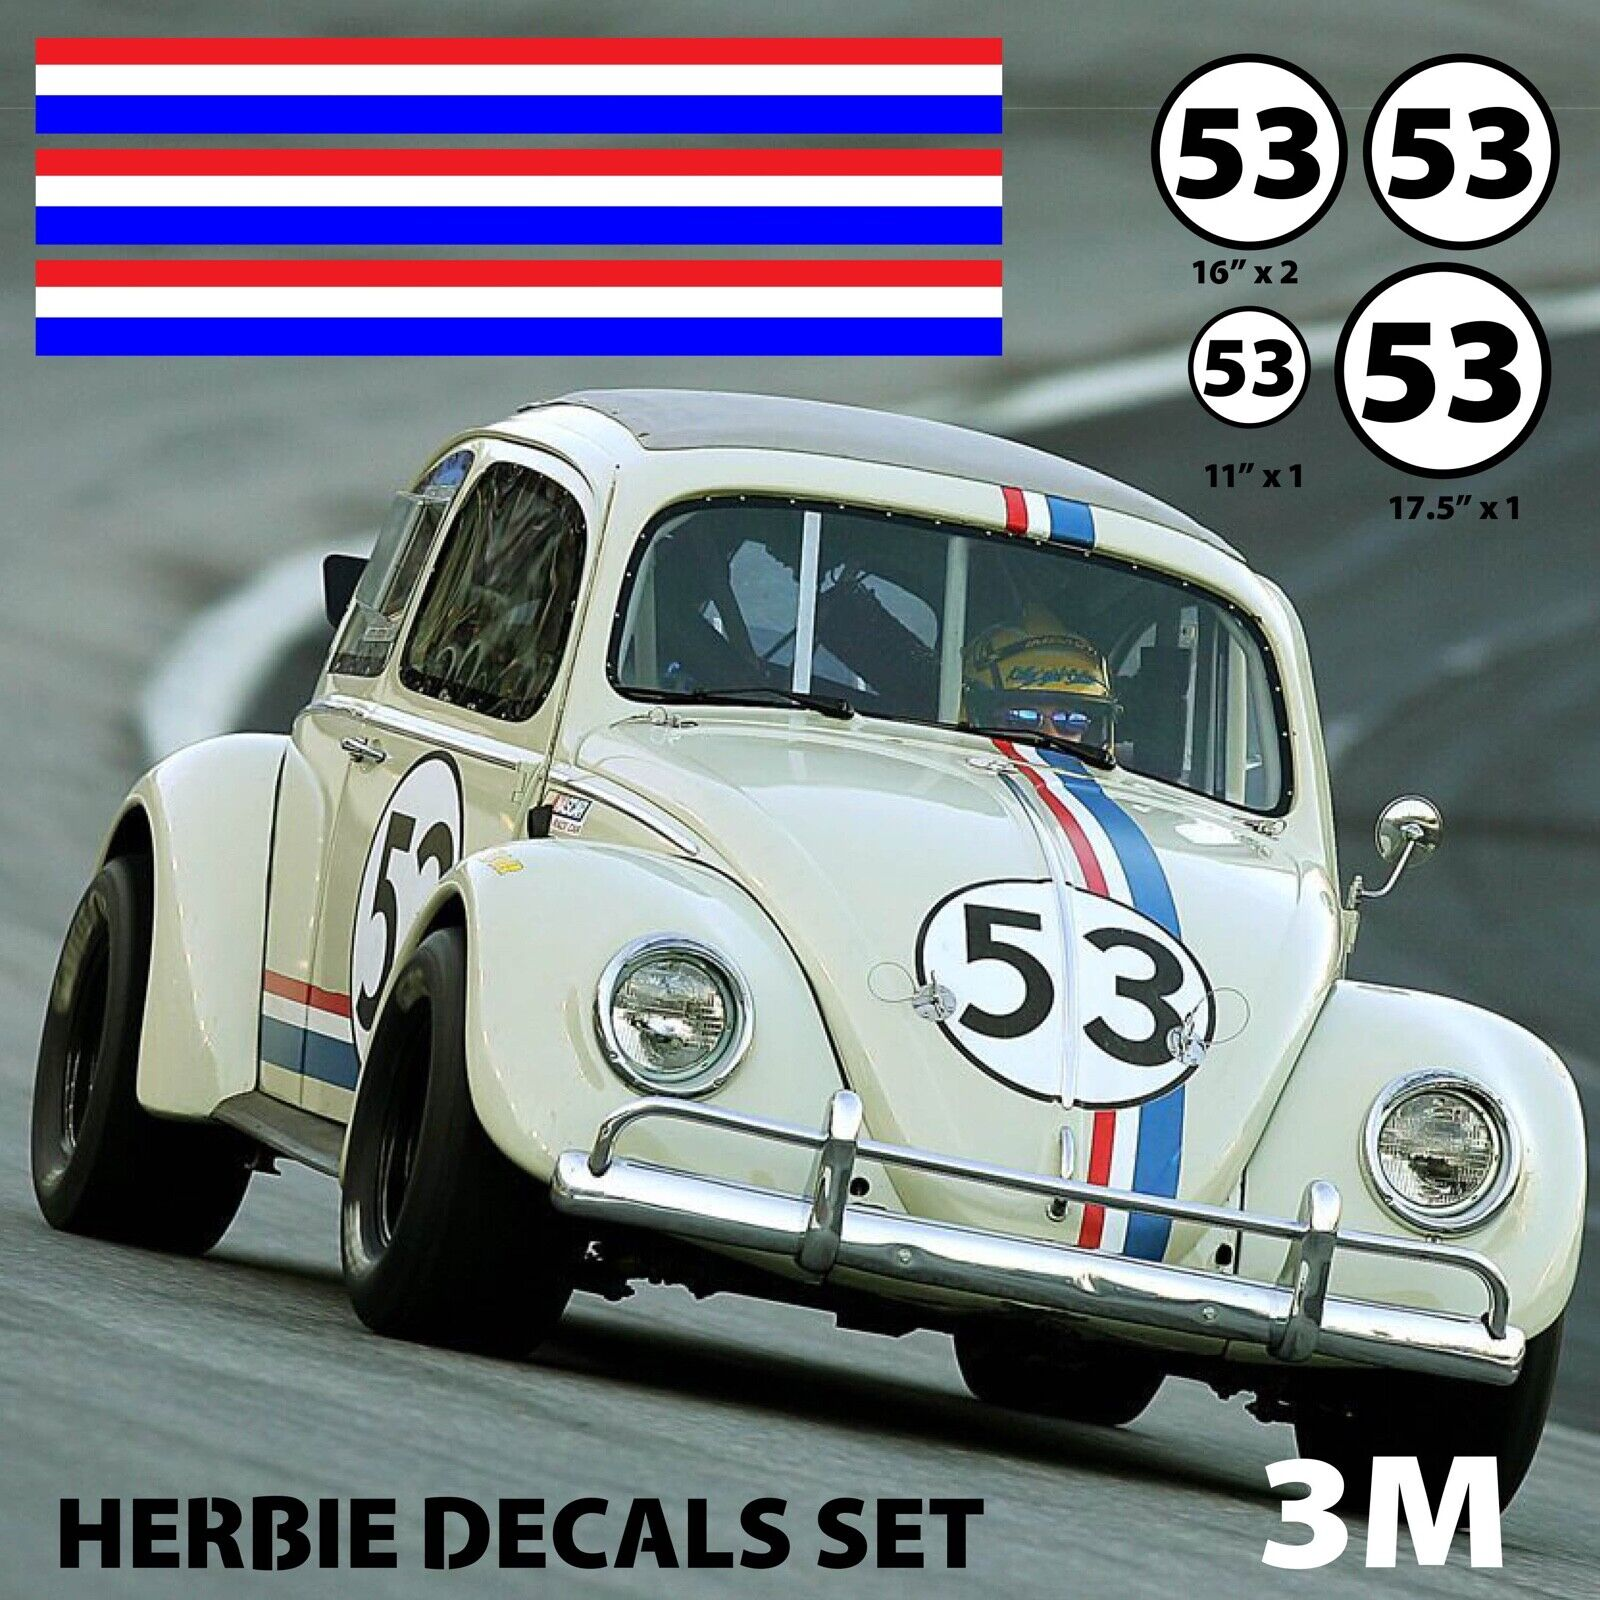 HERBIE 53 STICKER Ø 3 à 100 cm effet Usé Racing Le mans cox SCRATCHED NON GULF .